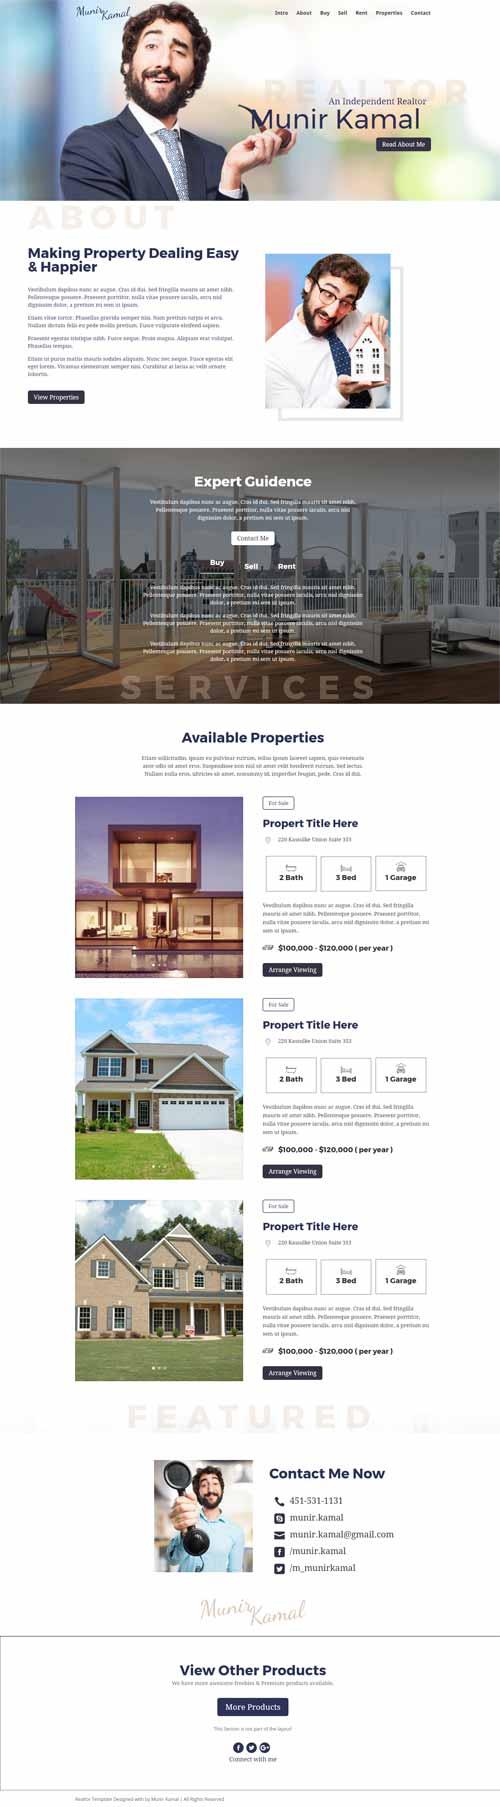 divi theme real estate layout